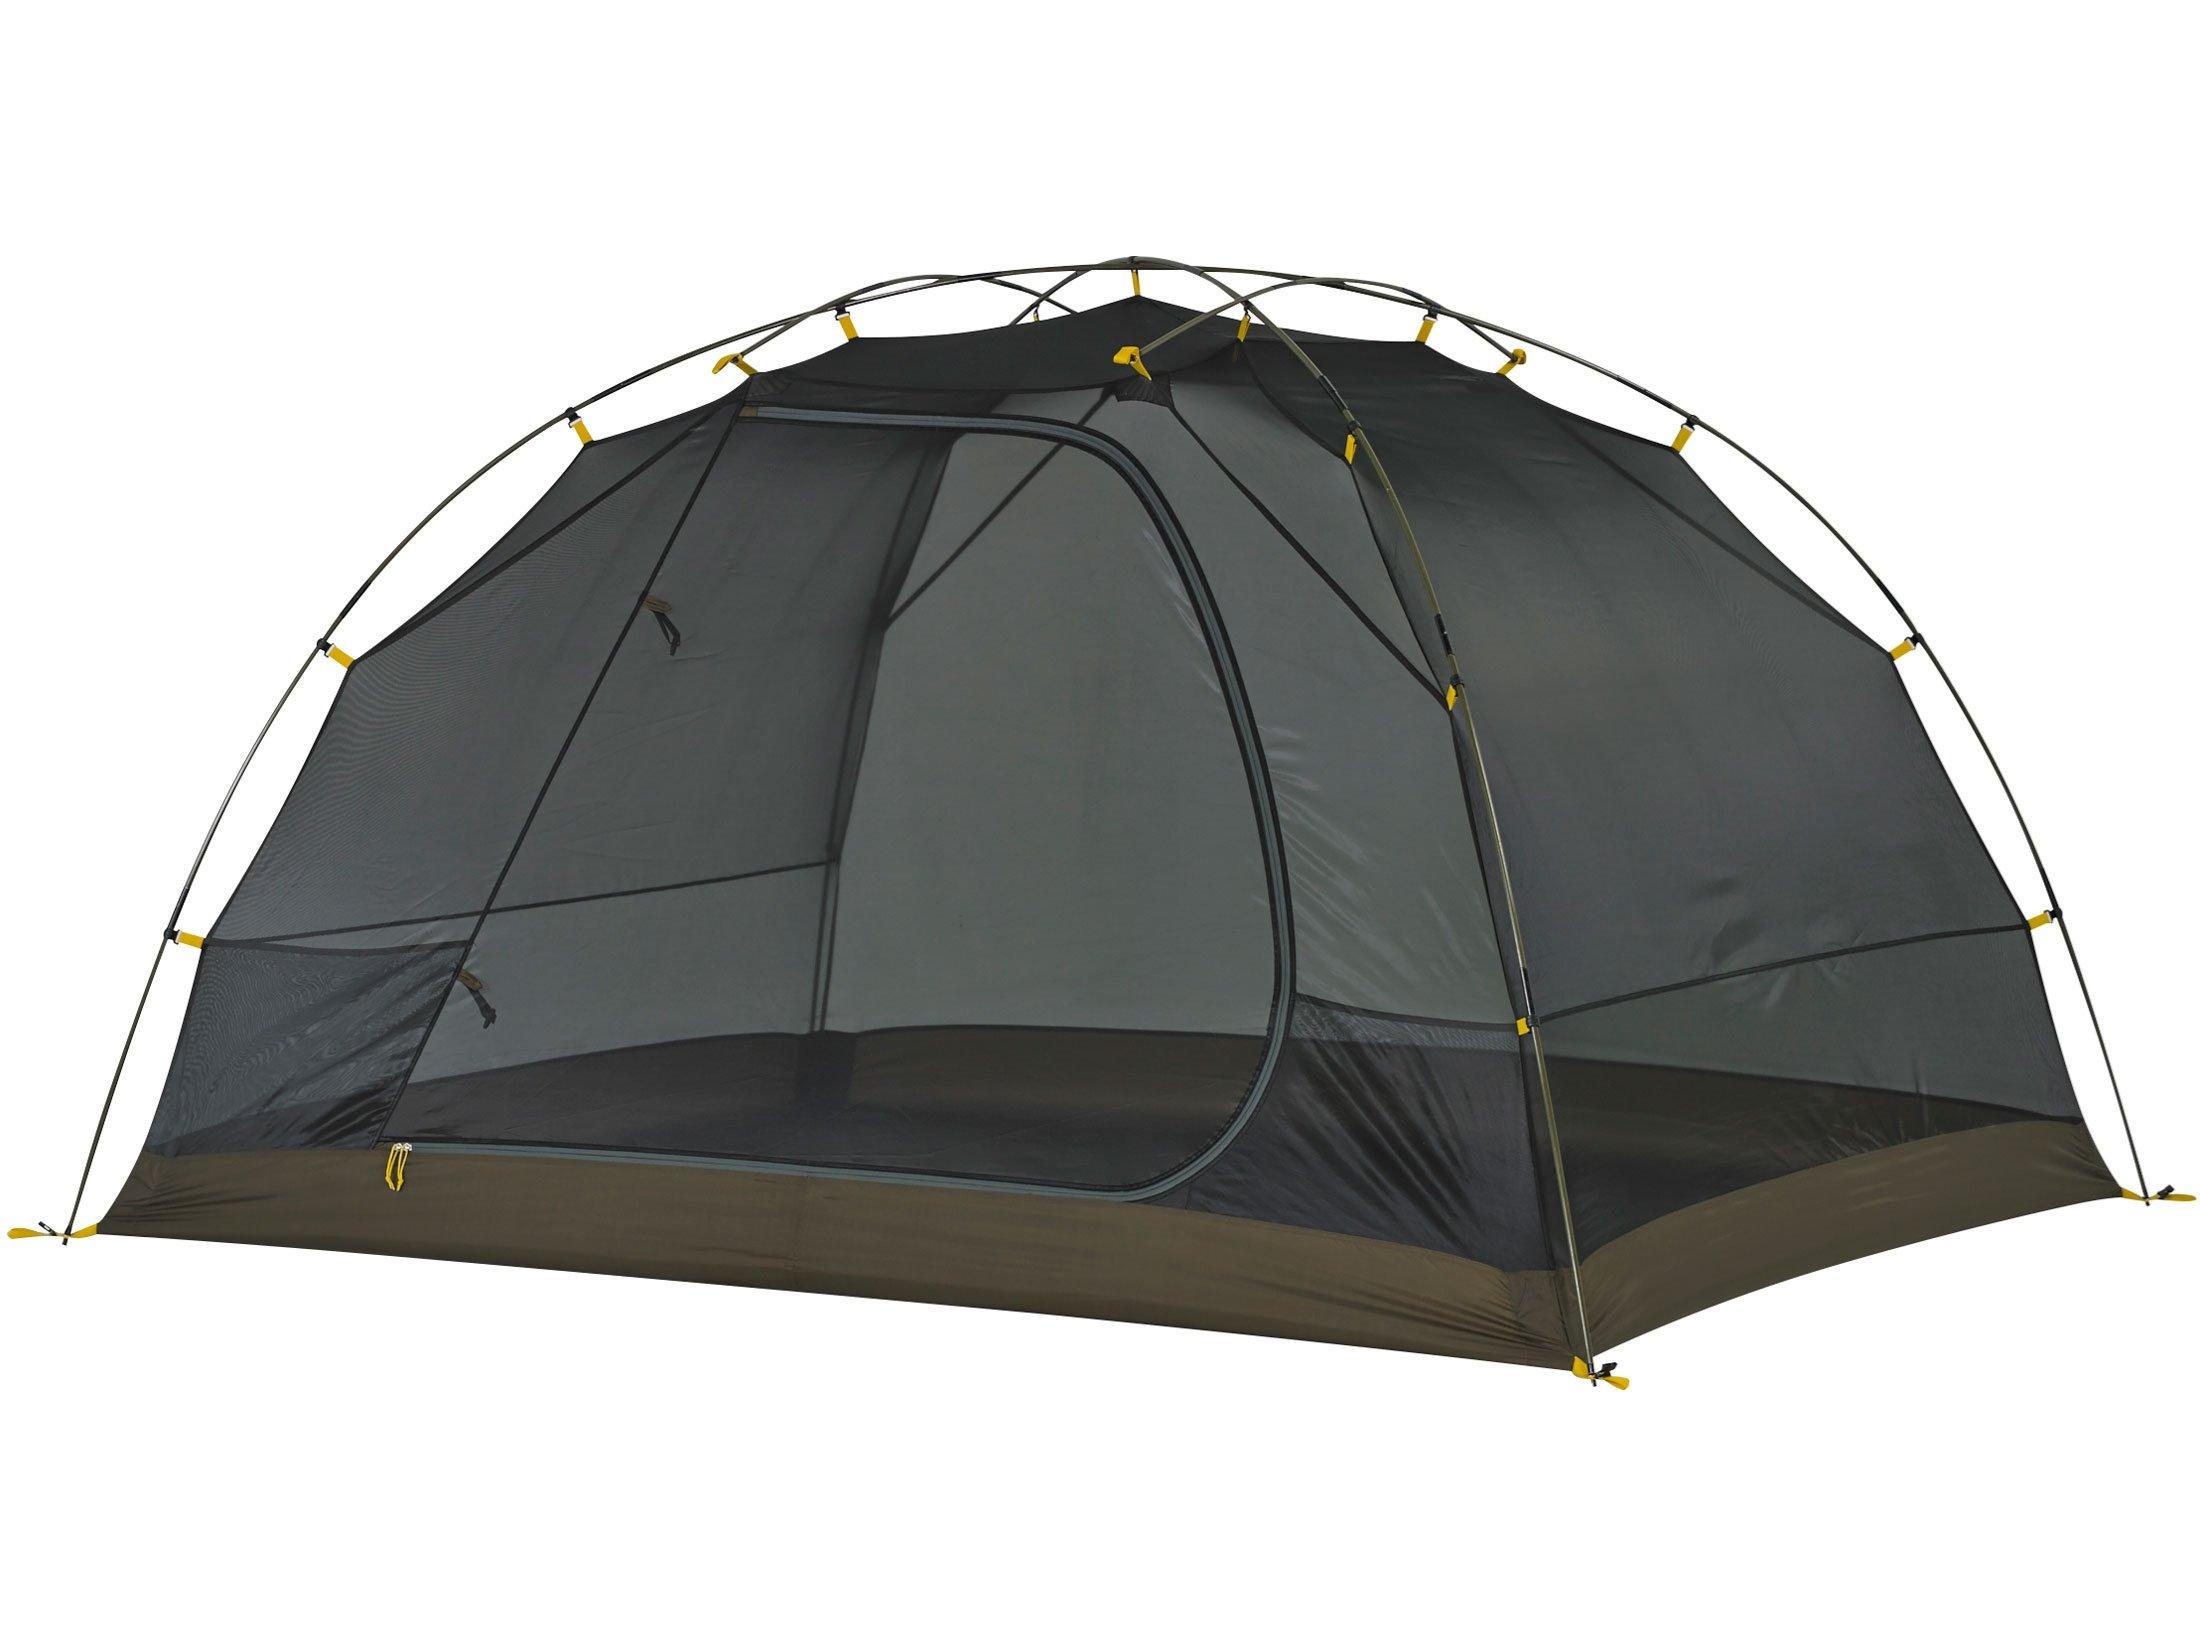 Slumberjack Daybreak 4 Person Dome Tent 99'' x 84'' x 58.5'' Polyester Green